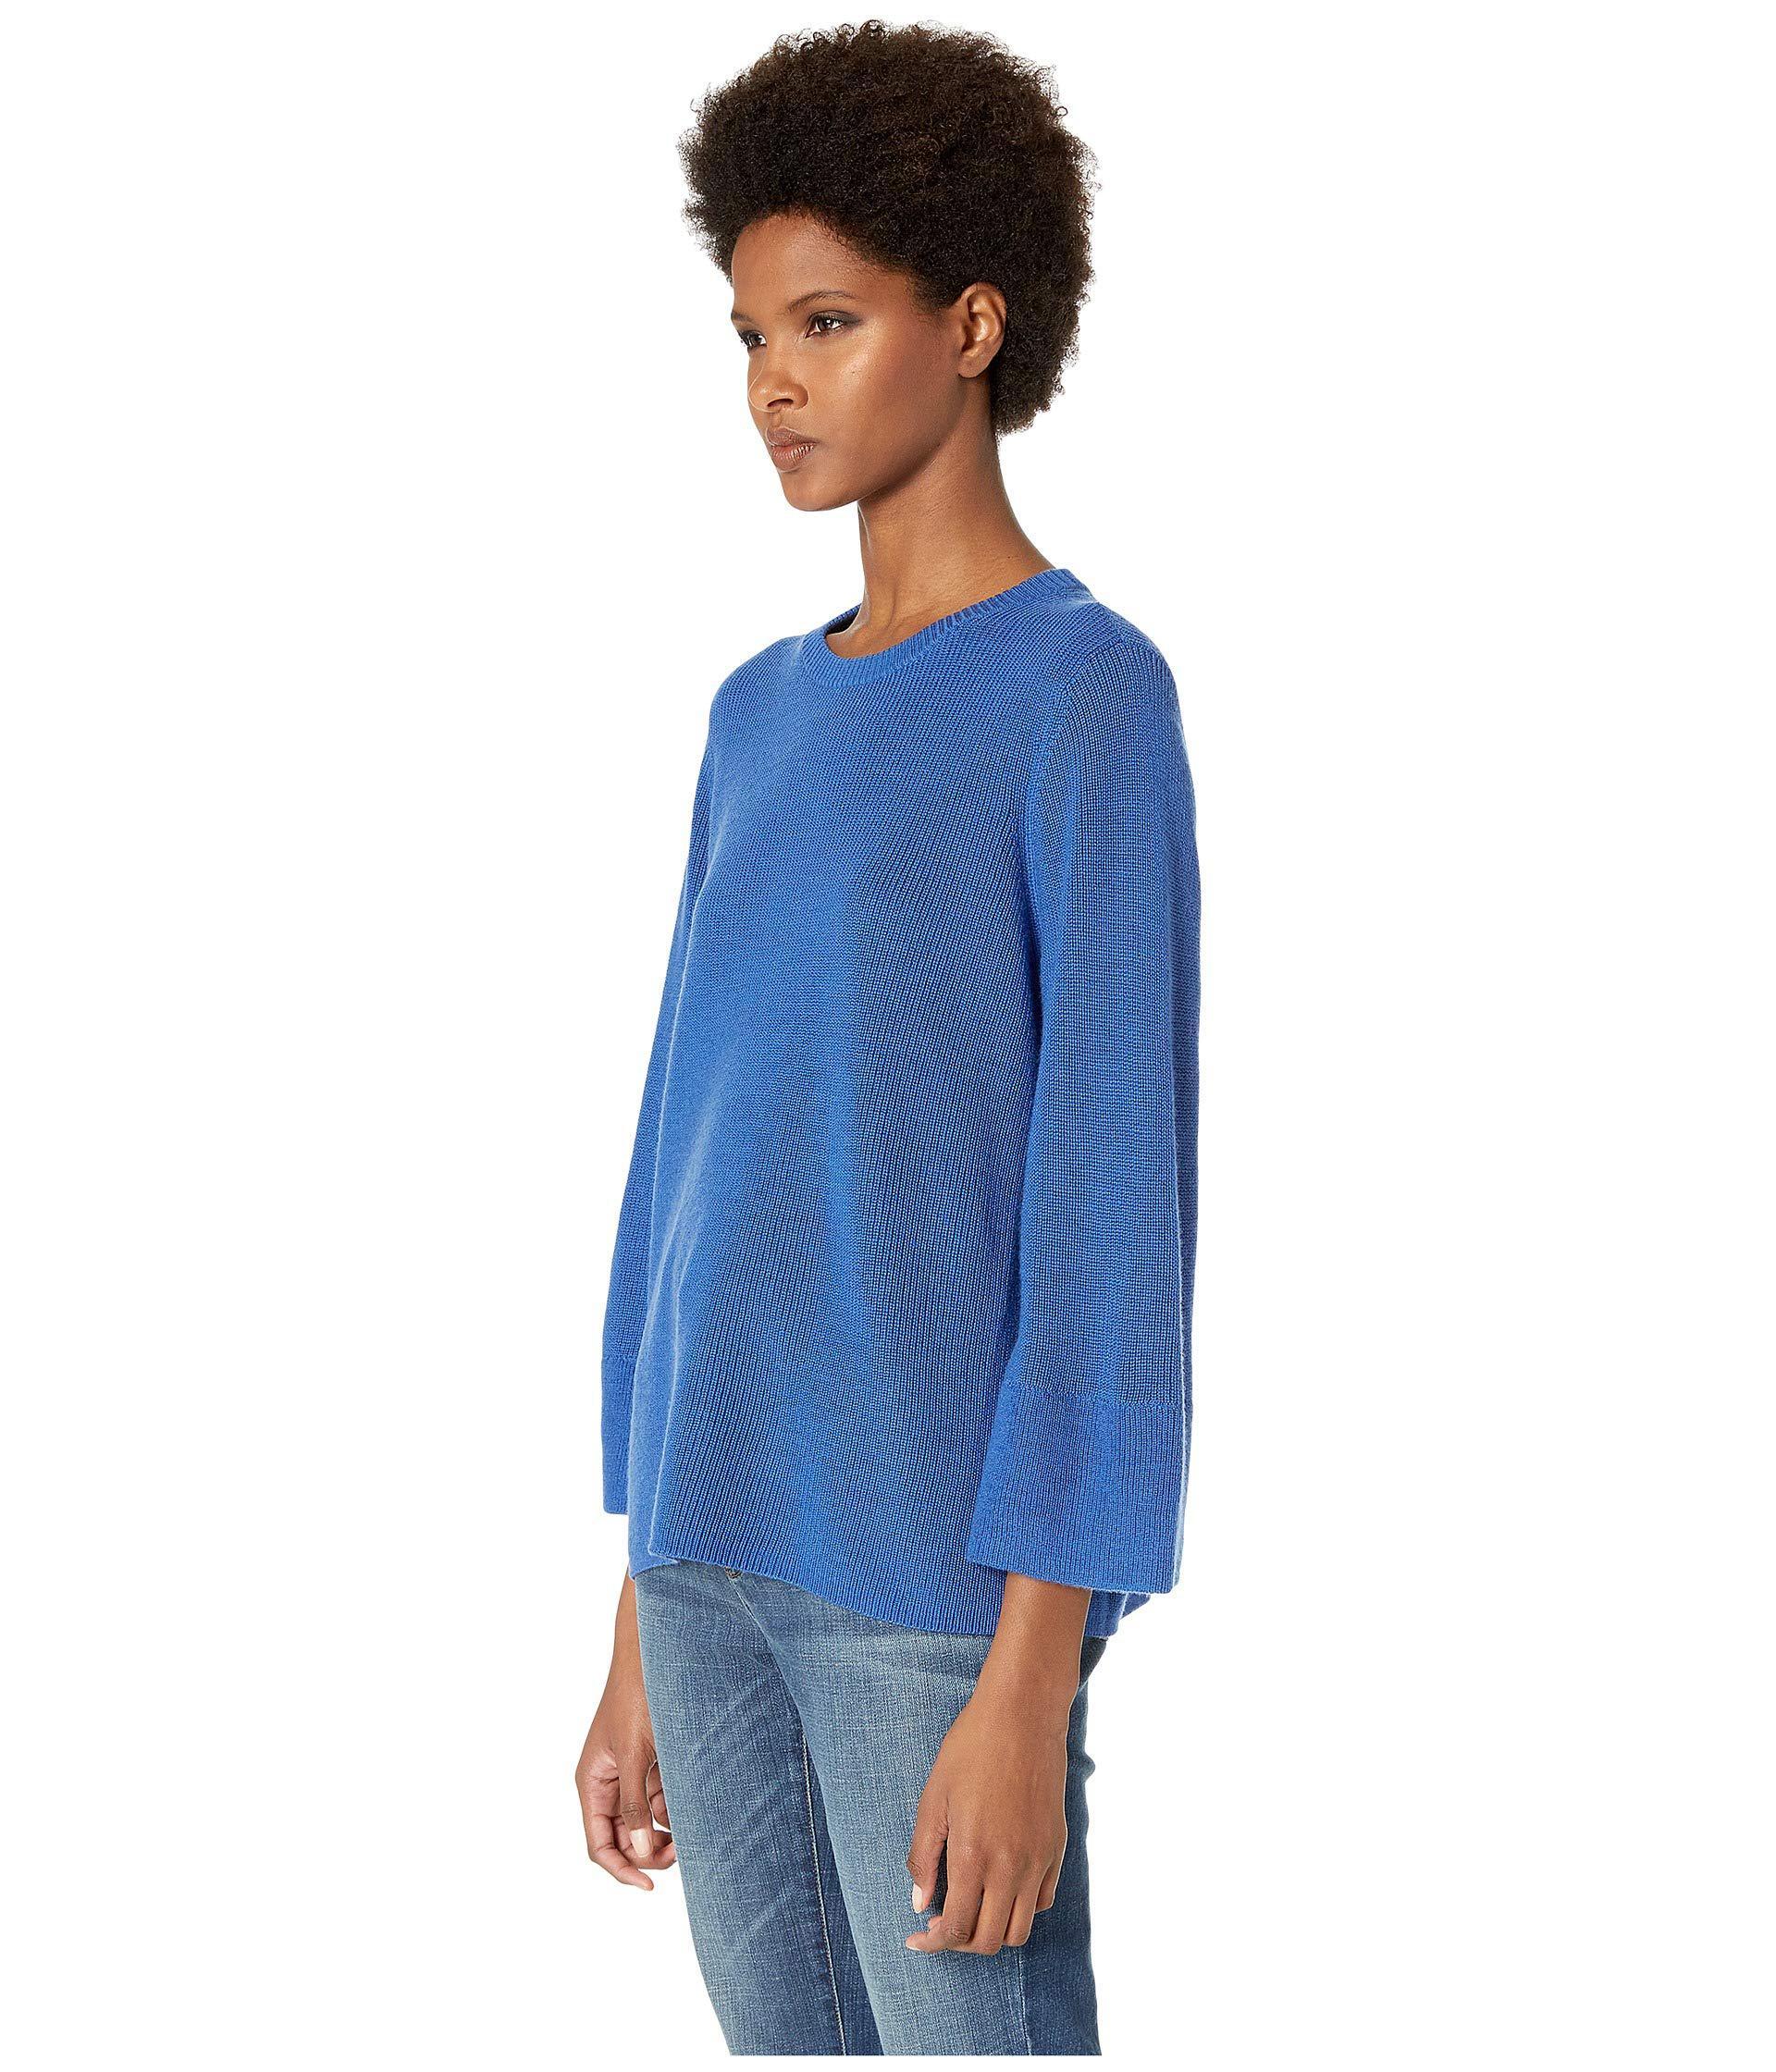 8d19de7eca77bf Lyst - Eileen Fisher Crew Neck 3 4 Sleeve Box-top (neptune) Women s Sweater  in Blue